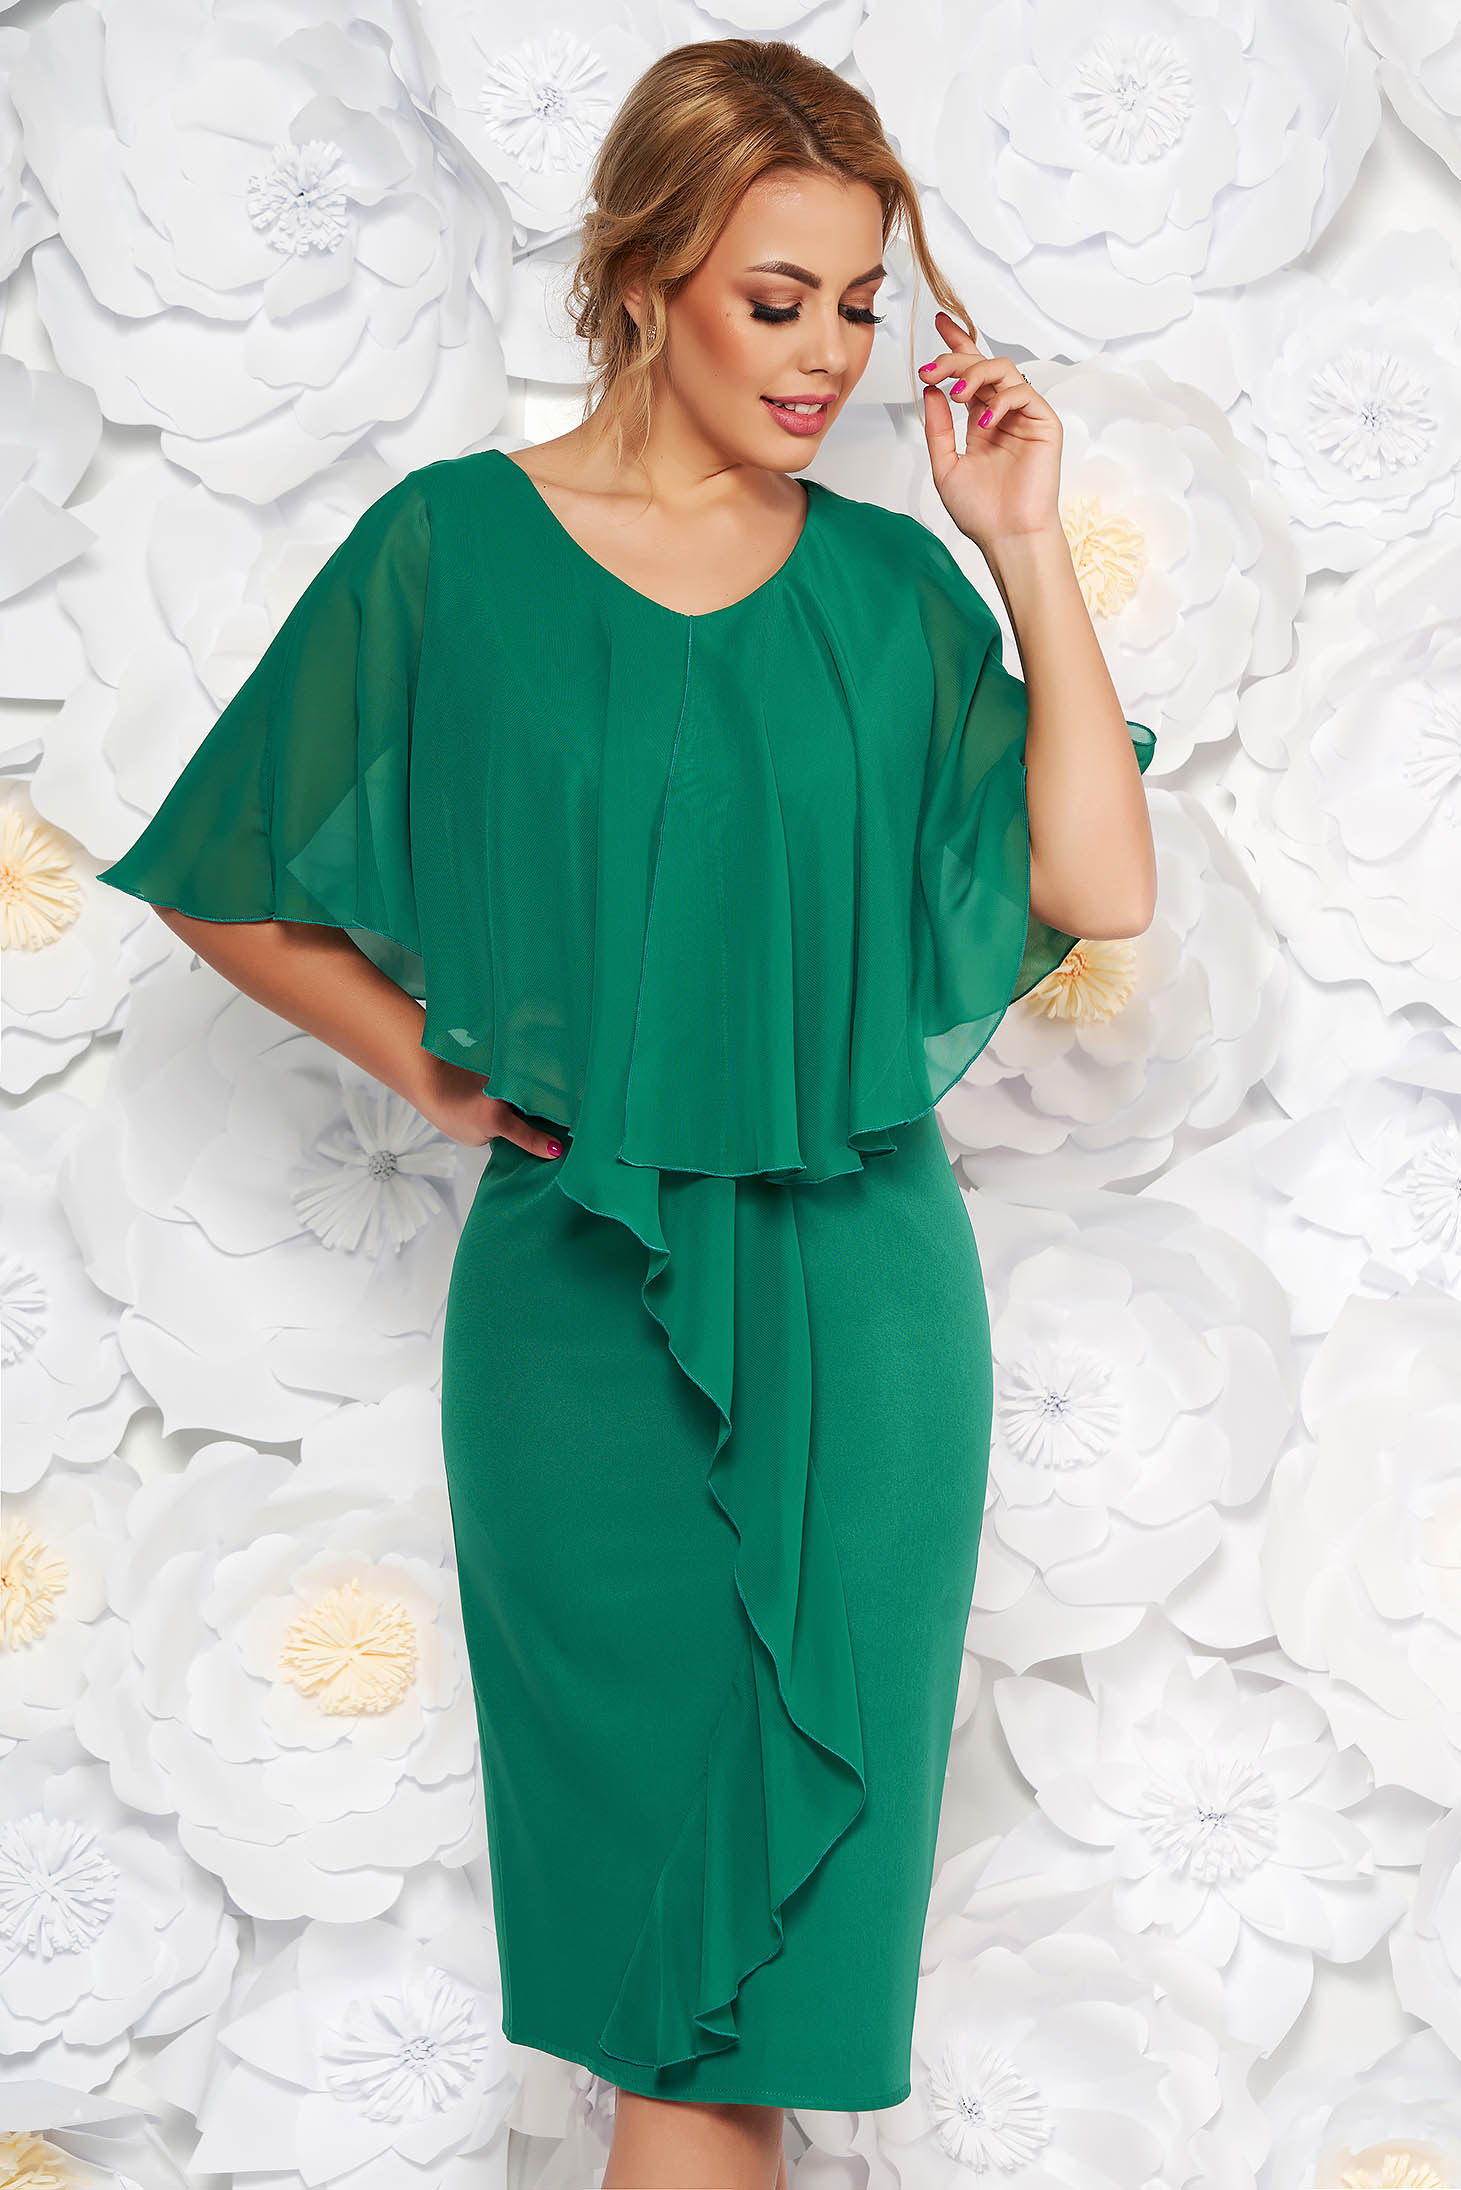 Rochie verde de ocazie midi fara maneci cu un croi cambrat din stofa subtire usor elastica suprapunere cu voal